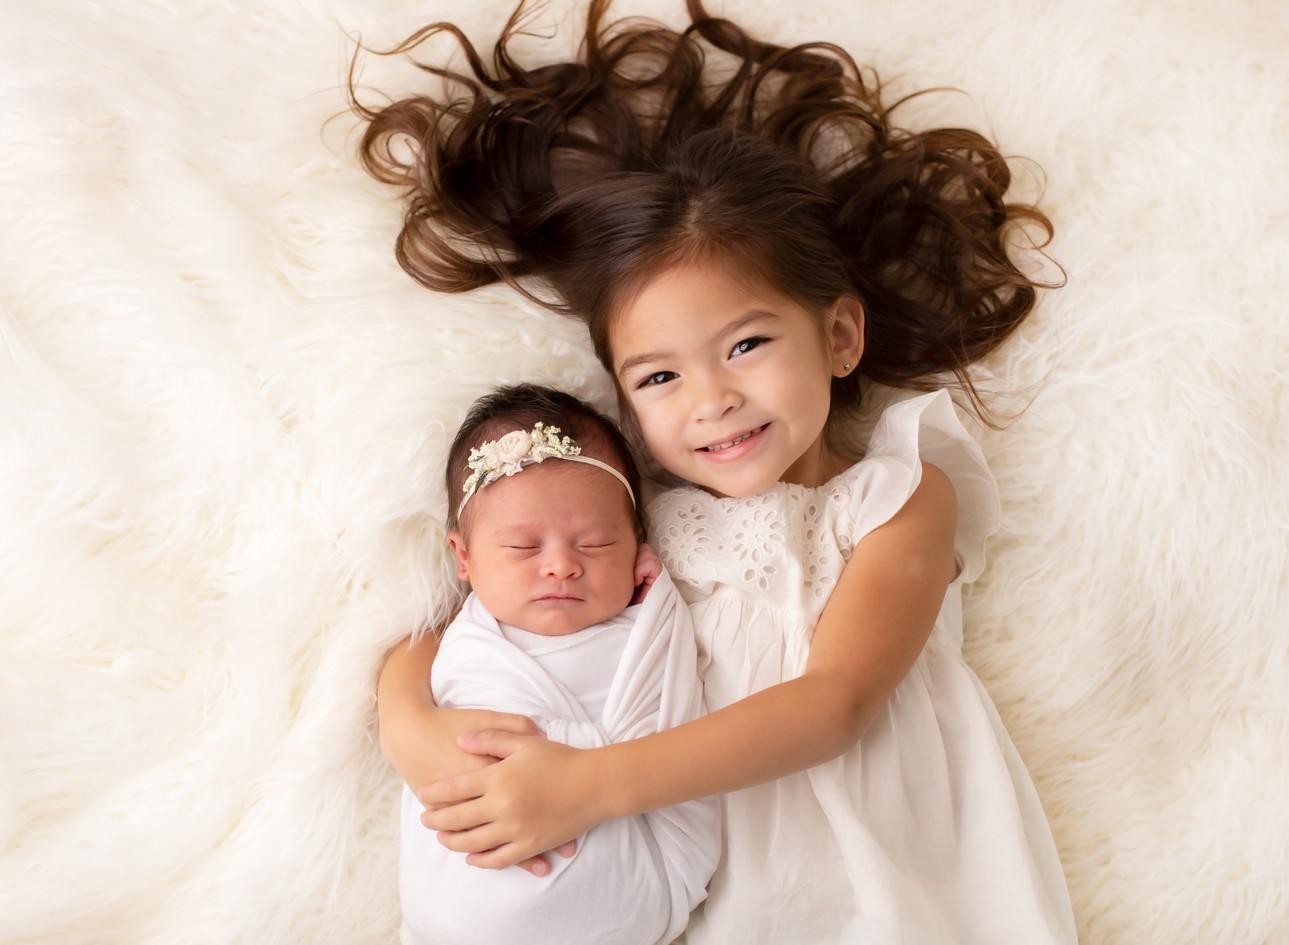 Newborn girl with big sister